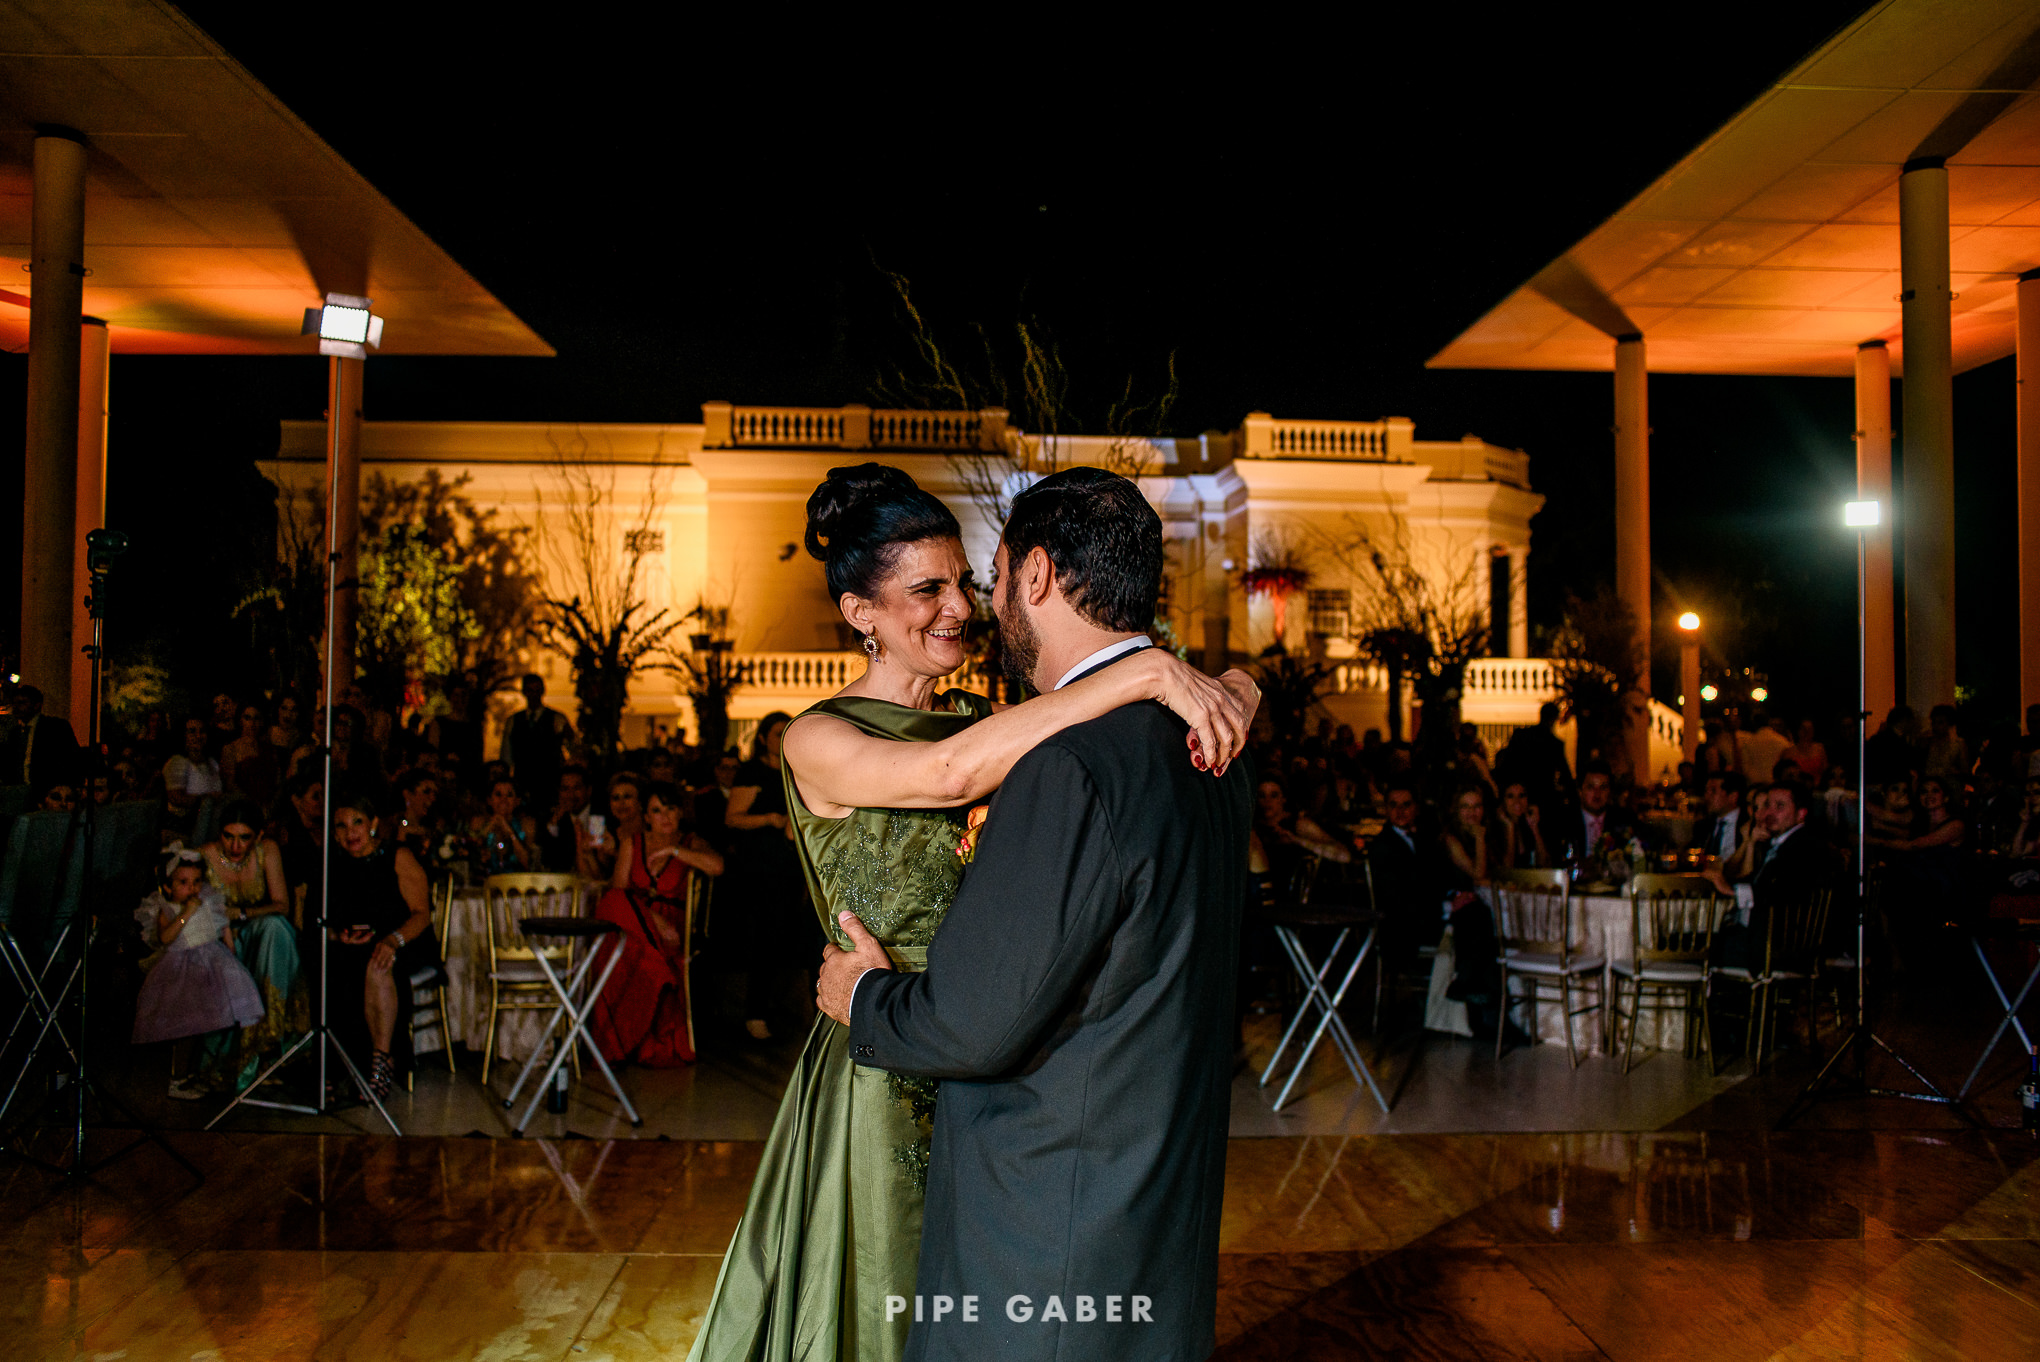 17_02_18_WEDDING_AIDITA_NEZBIT_MIGUEL_DOGRE_298_web.jpg